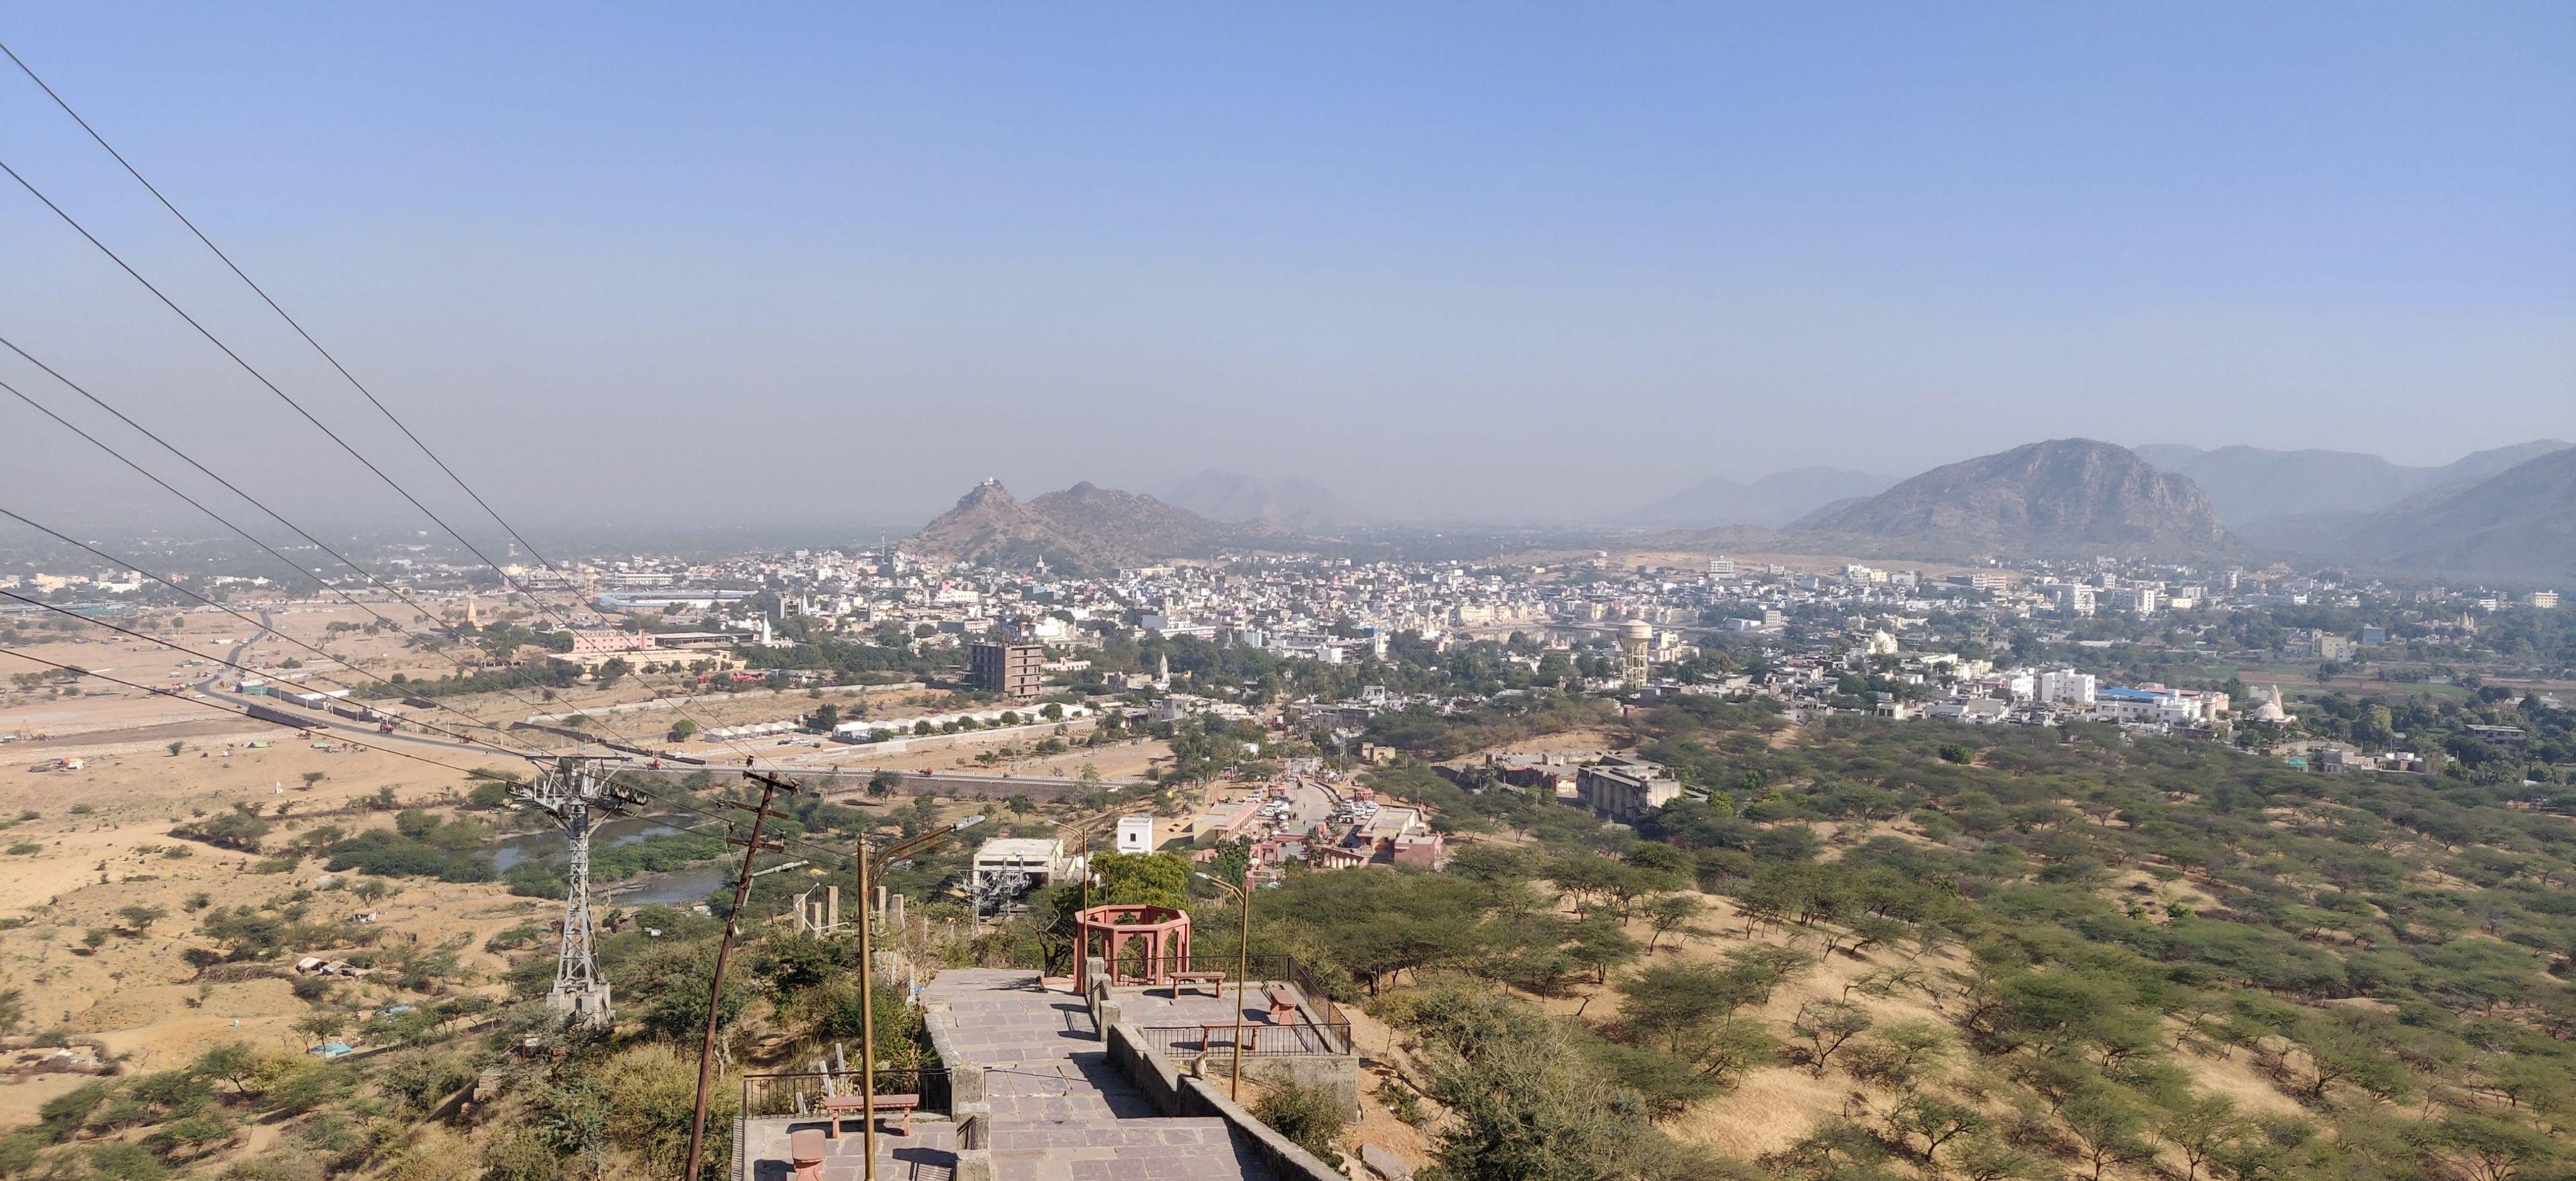 View of Pushkar city from Savitri Mata Temple